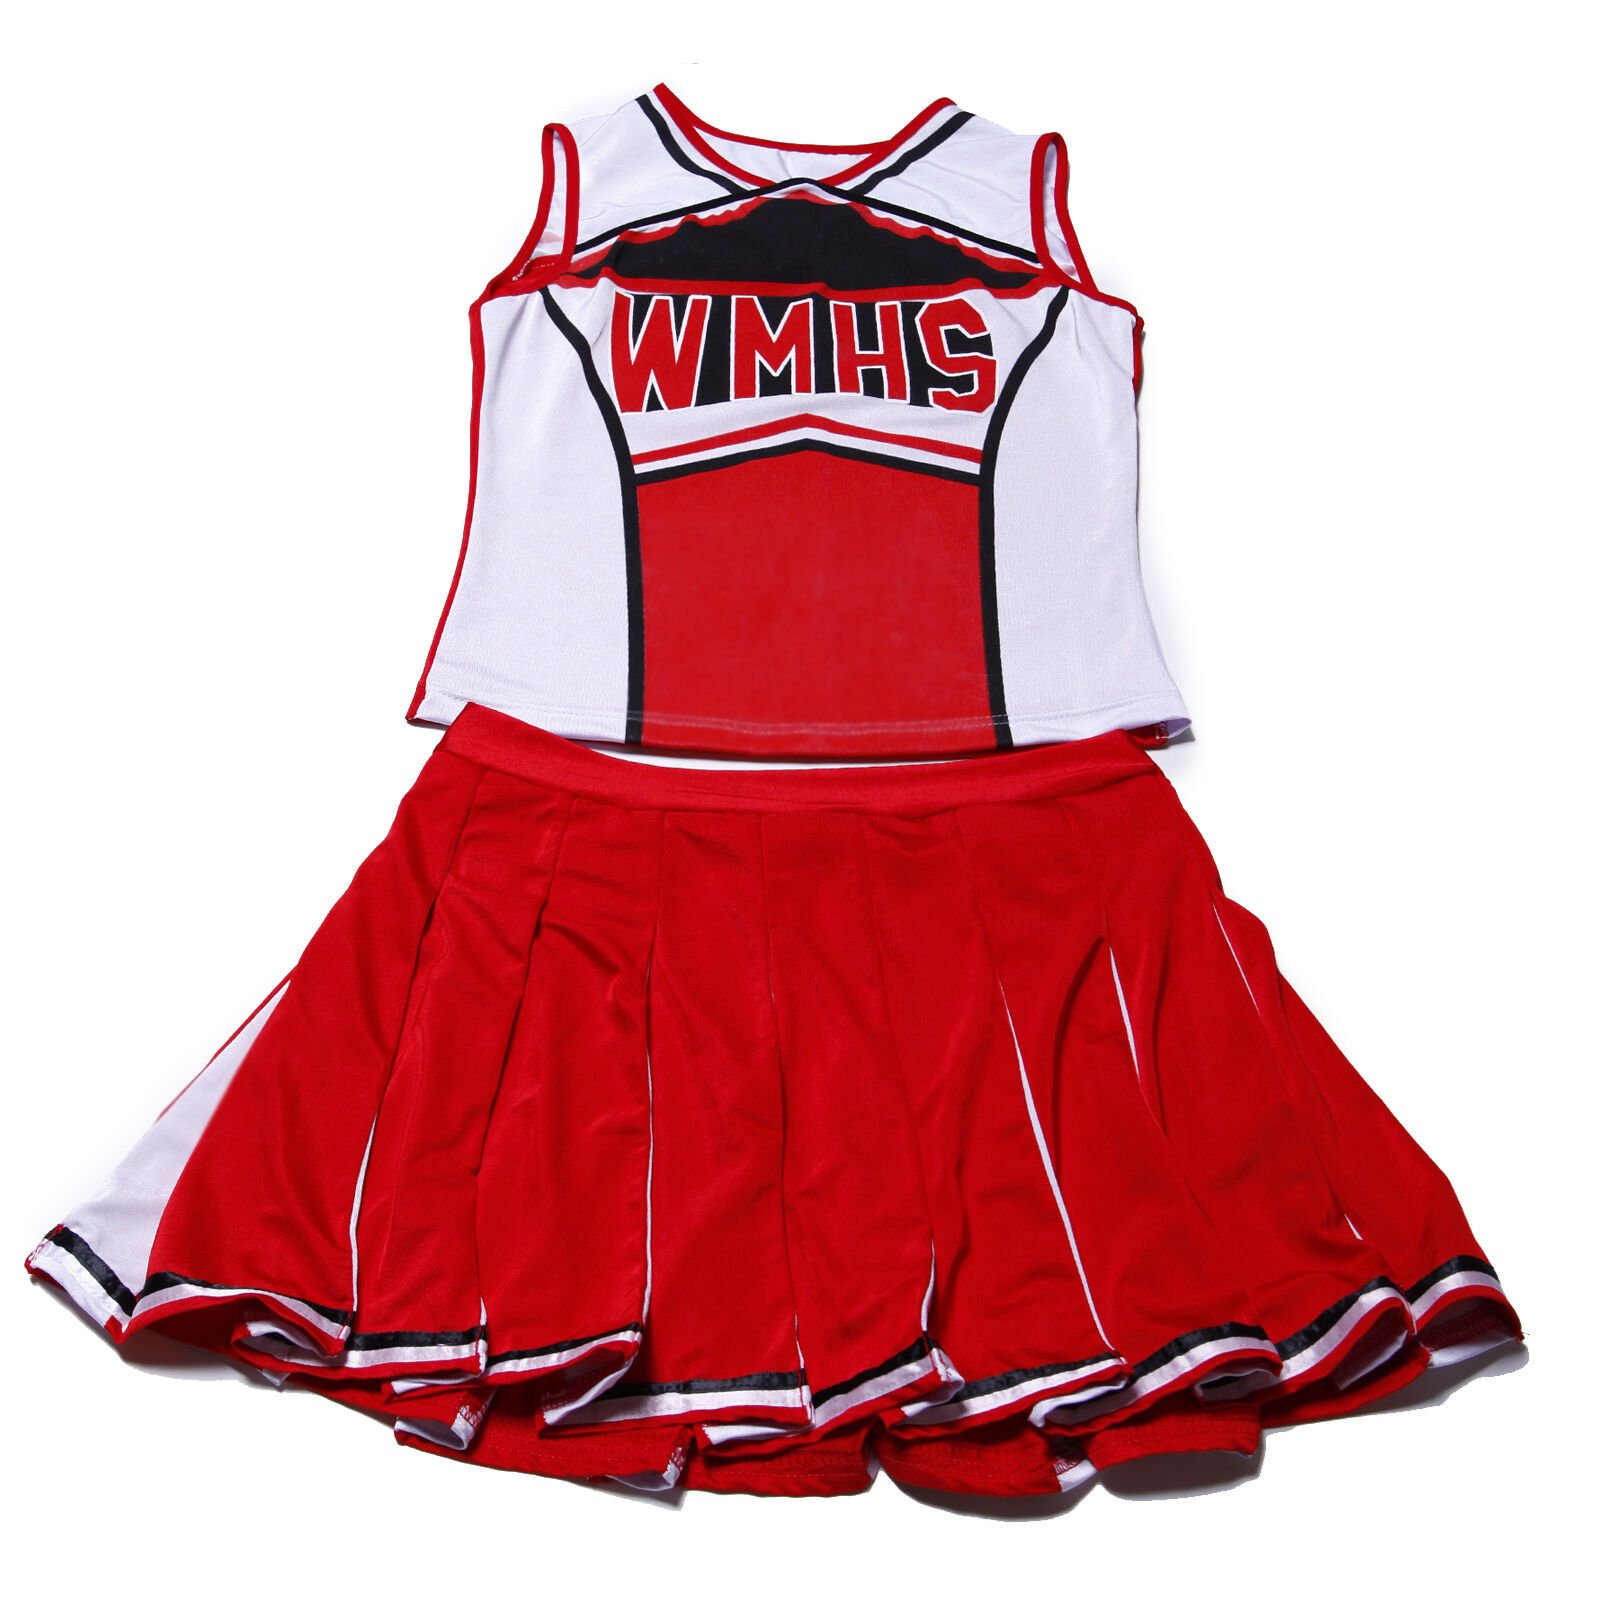 Cheerleader Cheerleading Glee Costume